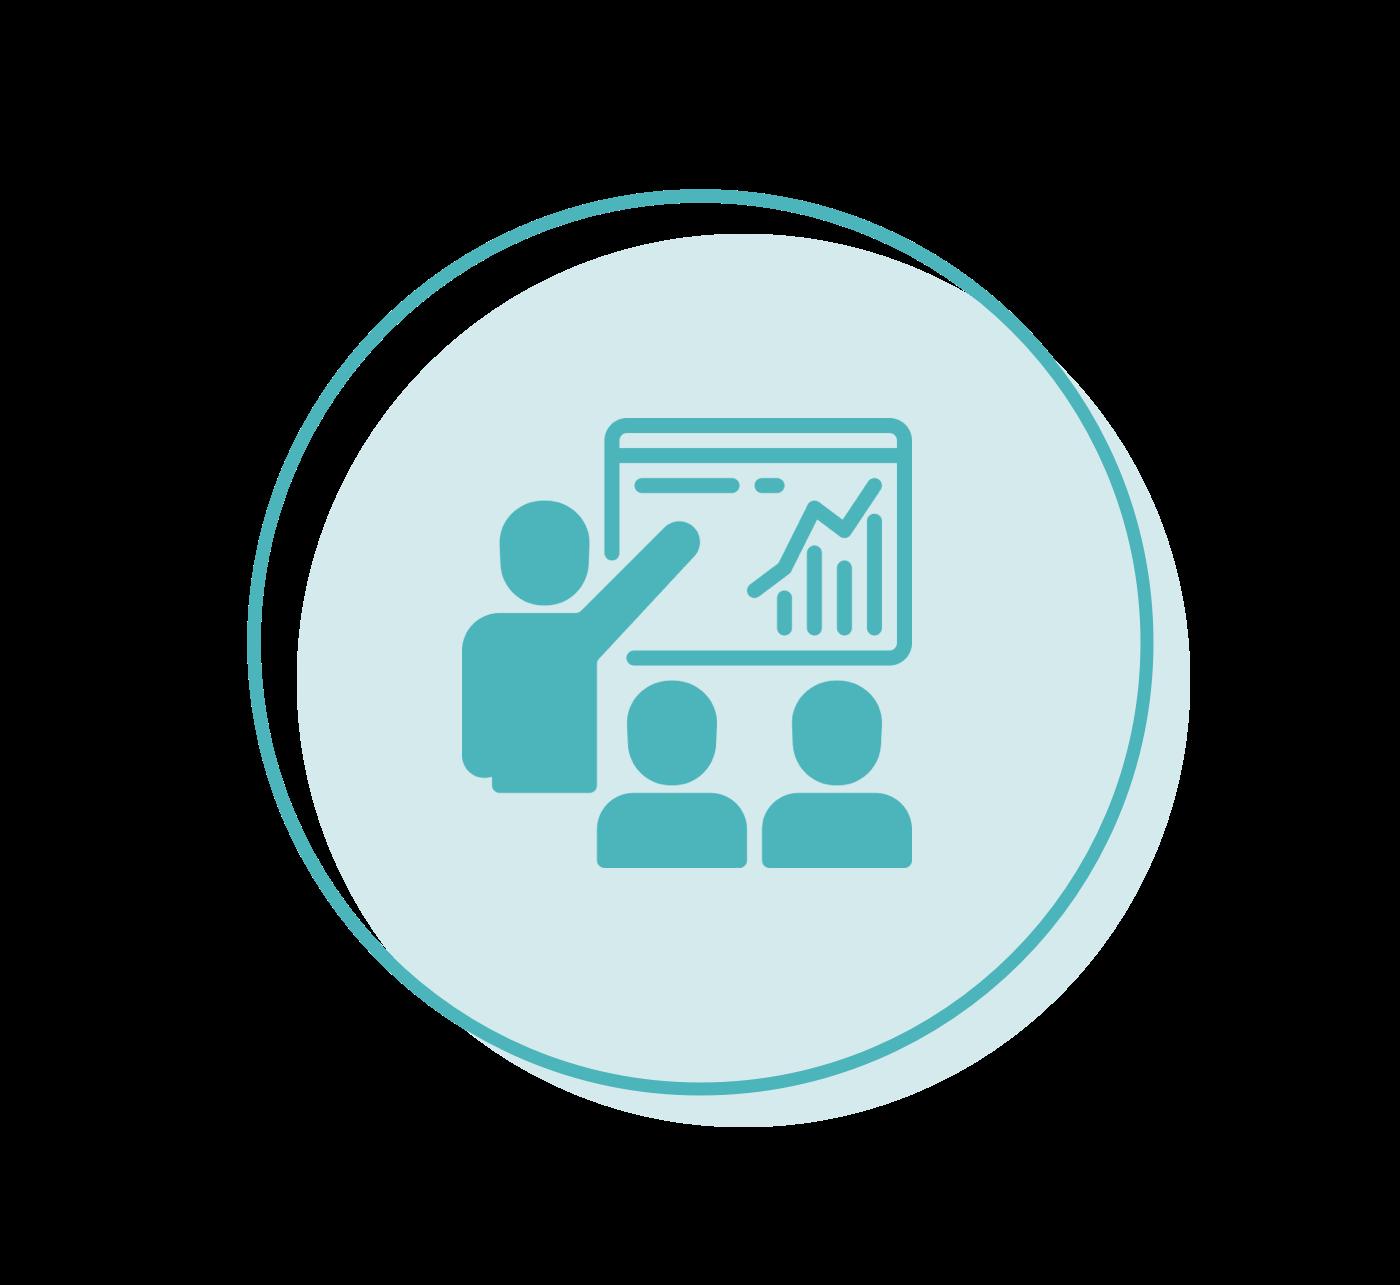 Hive email marketing CRM platform training icon